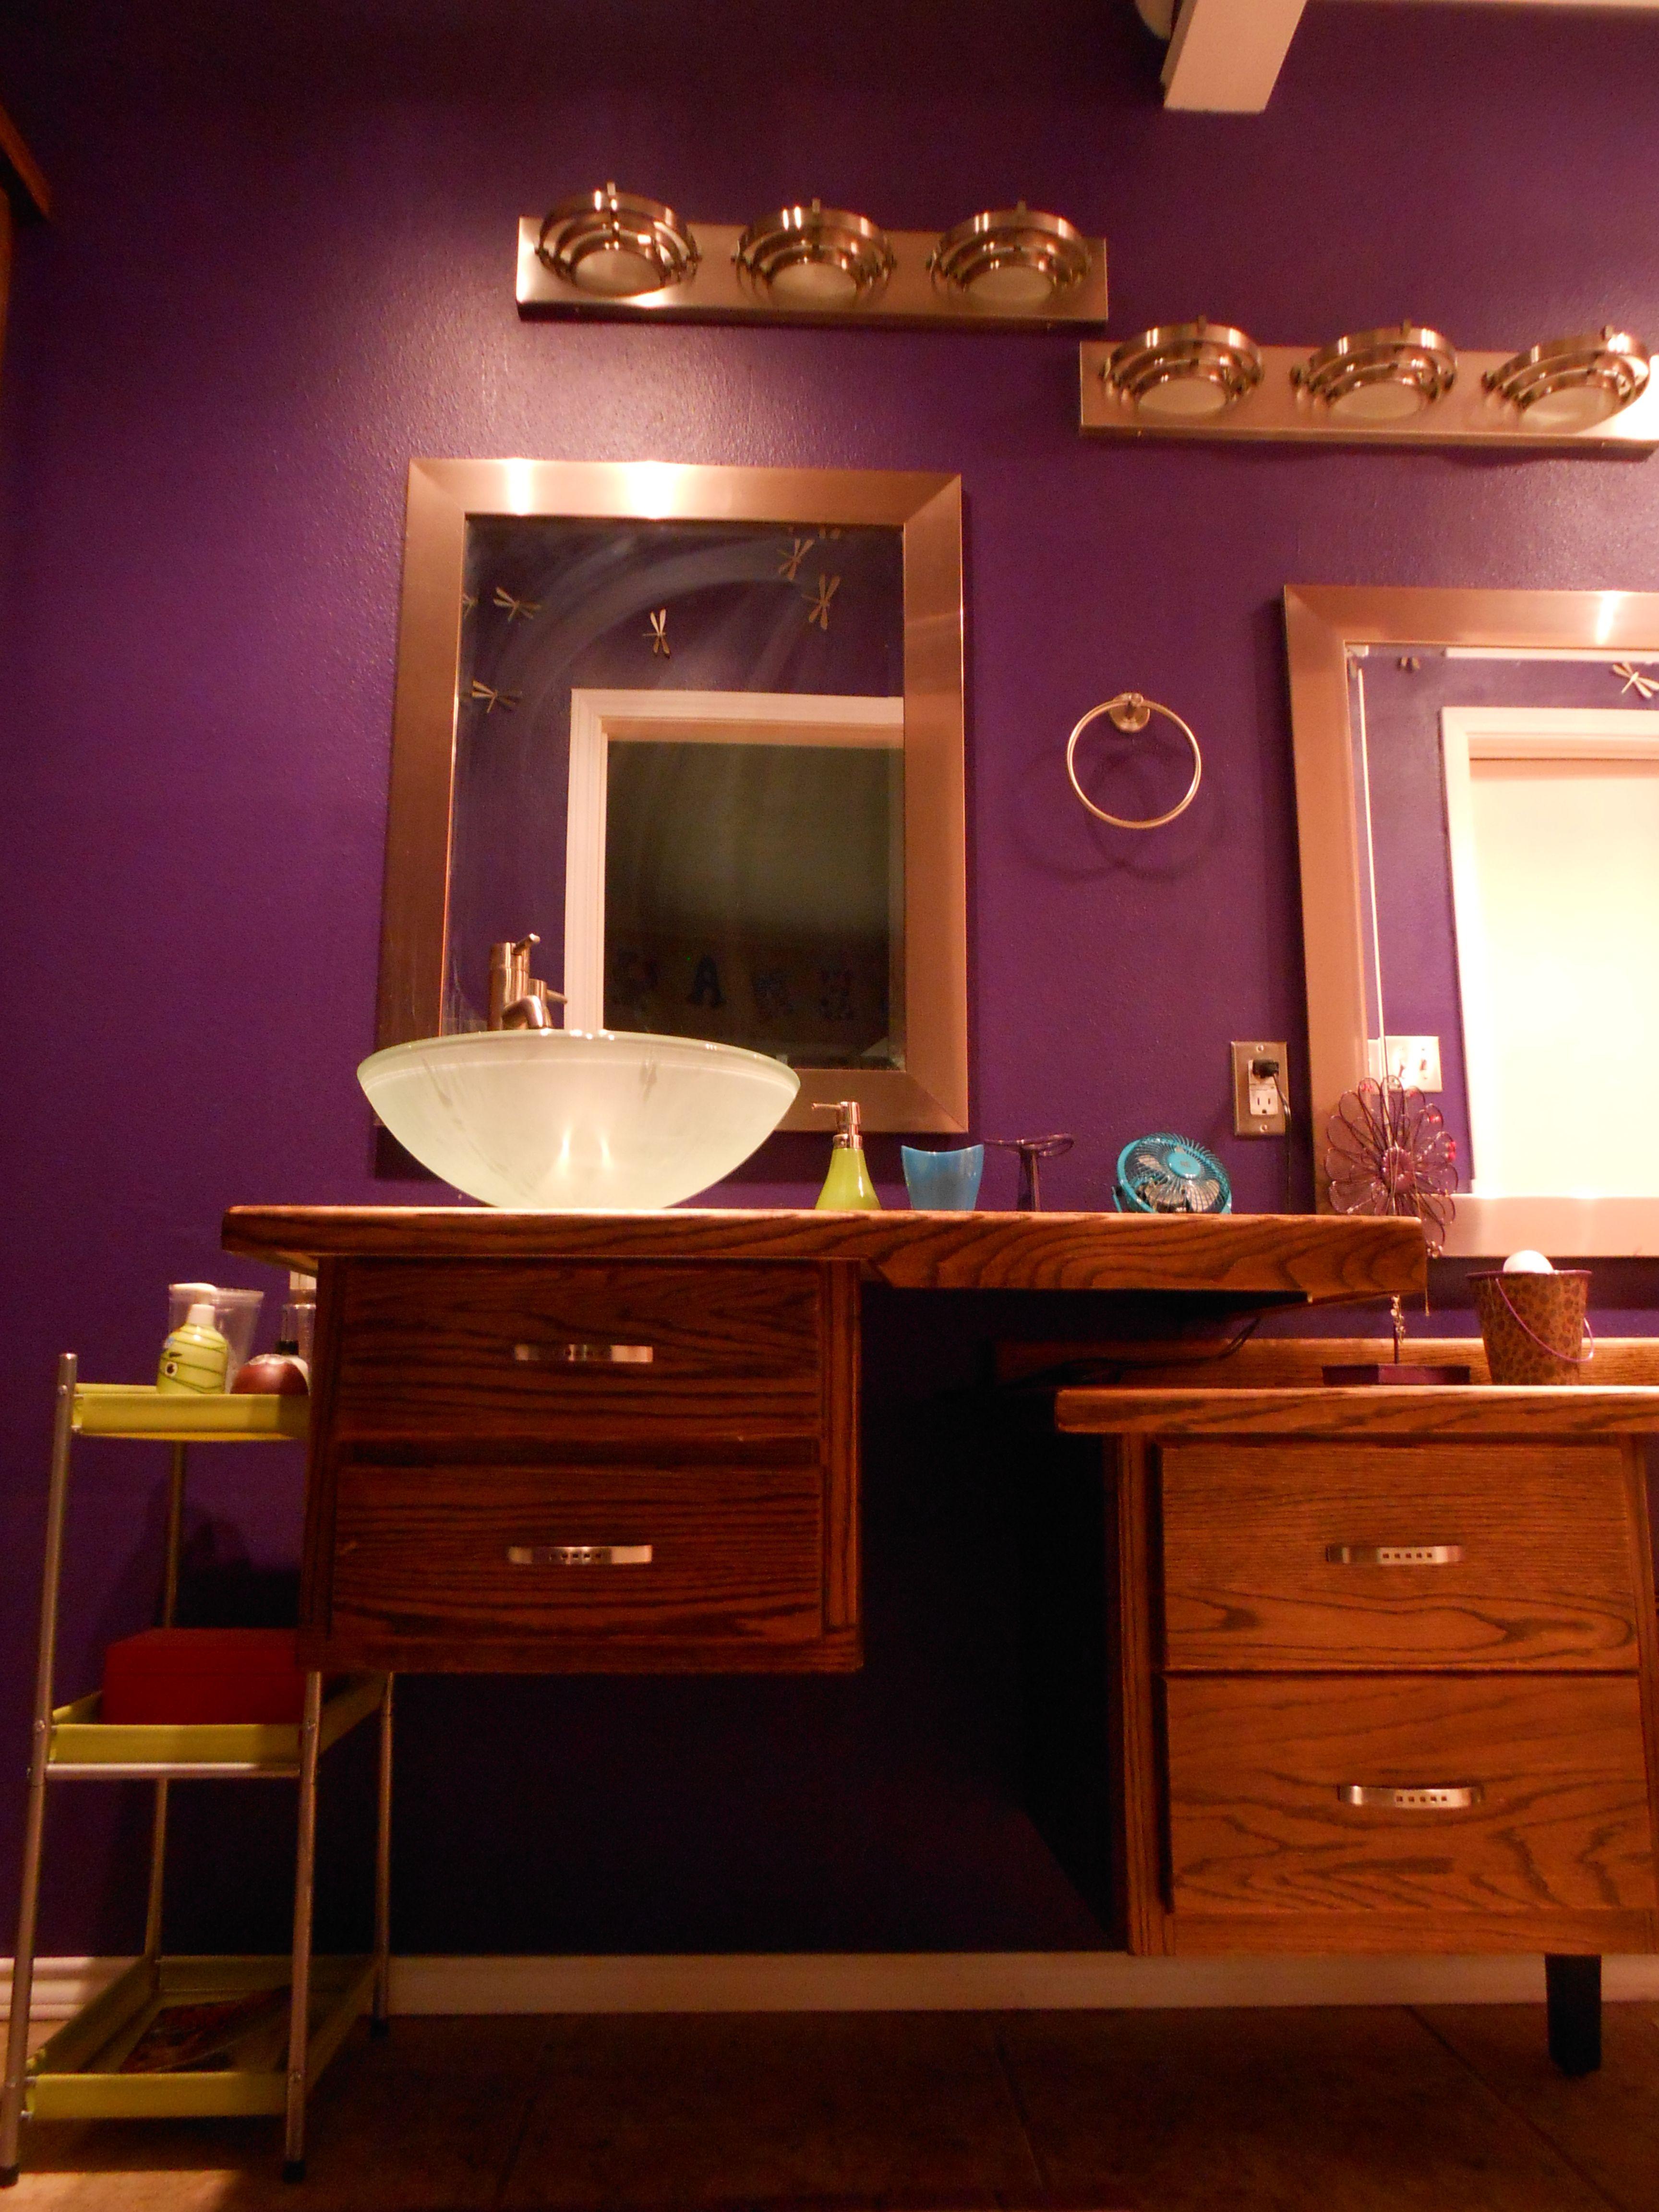 Teenage girl's bathroom | Home decor, Inside home ...